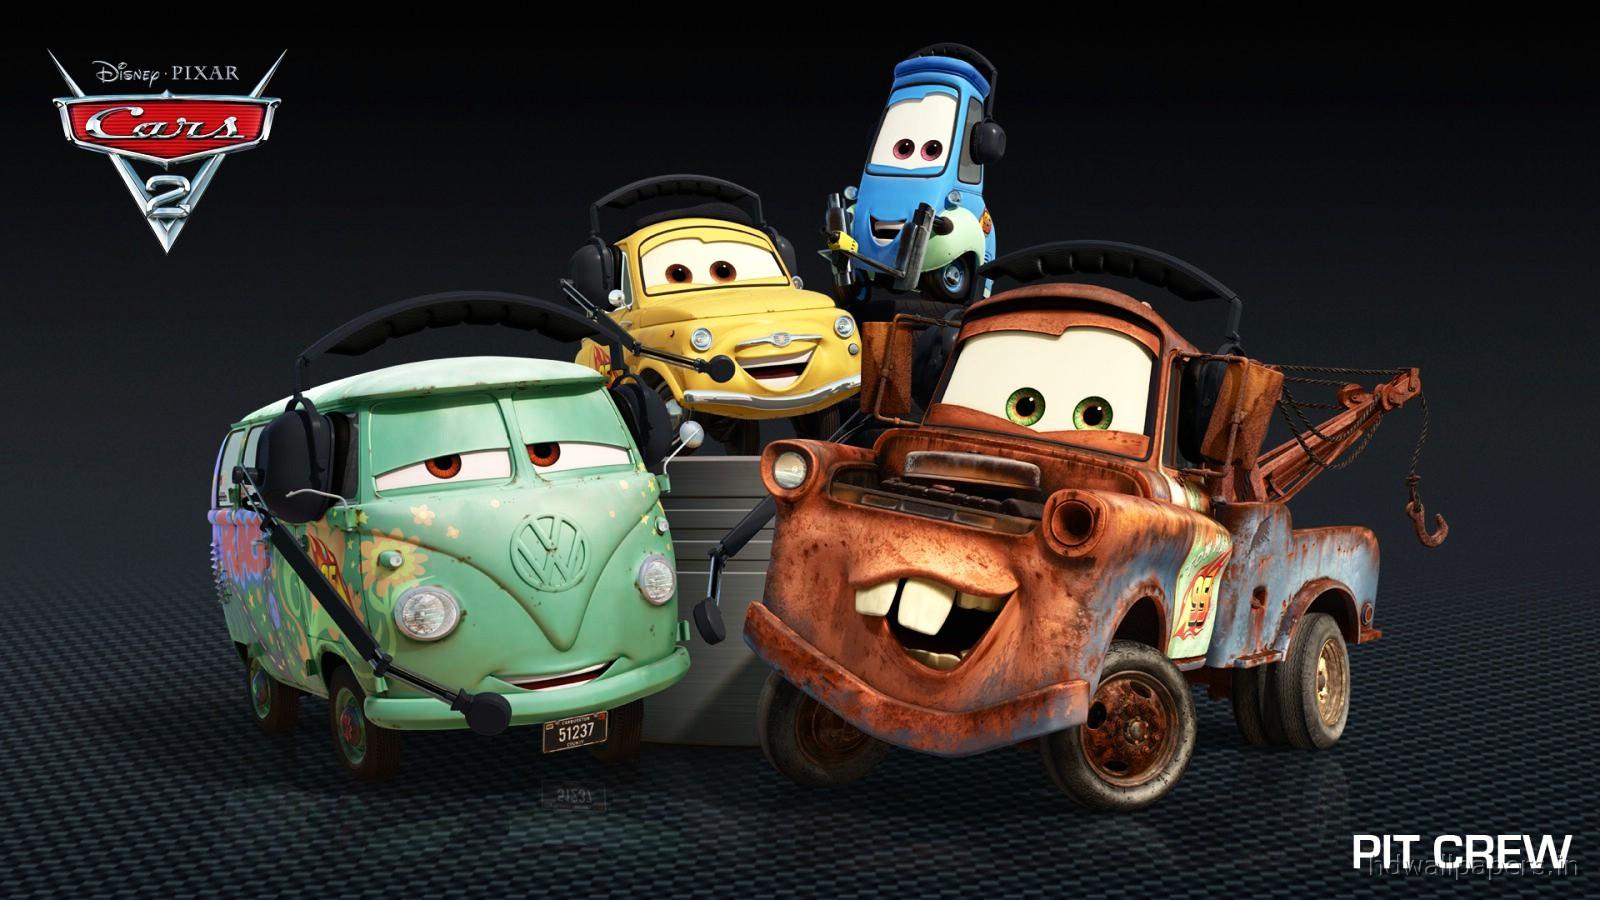 http://2.bp.blogspot.com/-V7o7Os7dORk/TflhYIhARfI/AAAAAAAACSQ/AU-0Oy5OZnk/s1600/pit_crew_in_cars_2-HD.jpg